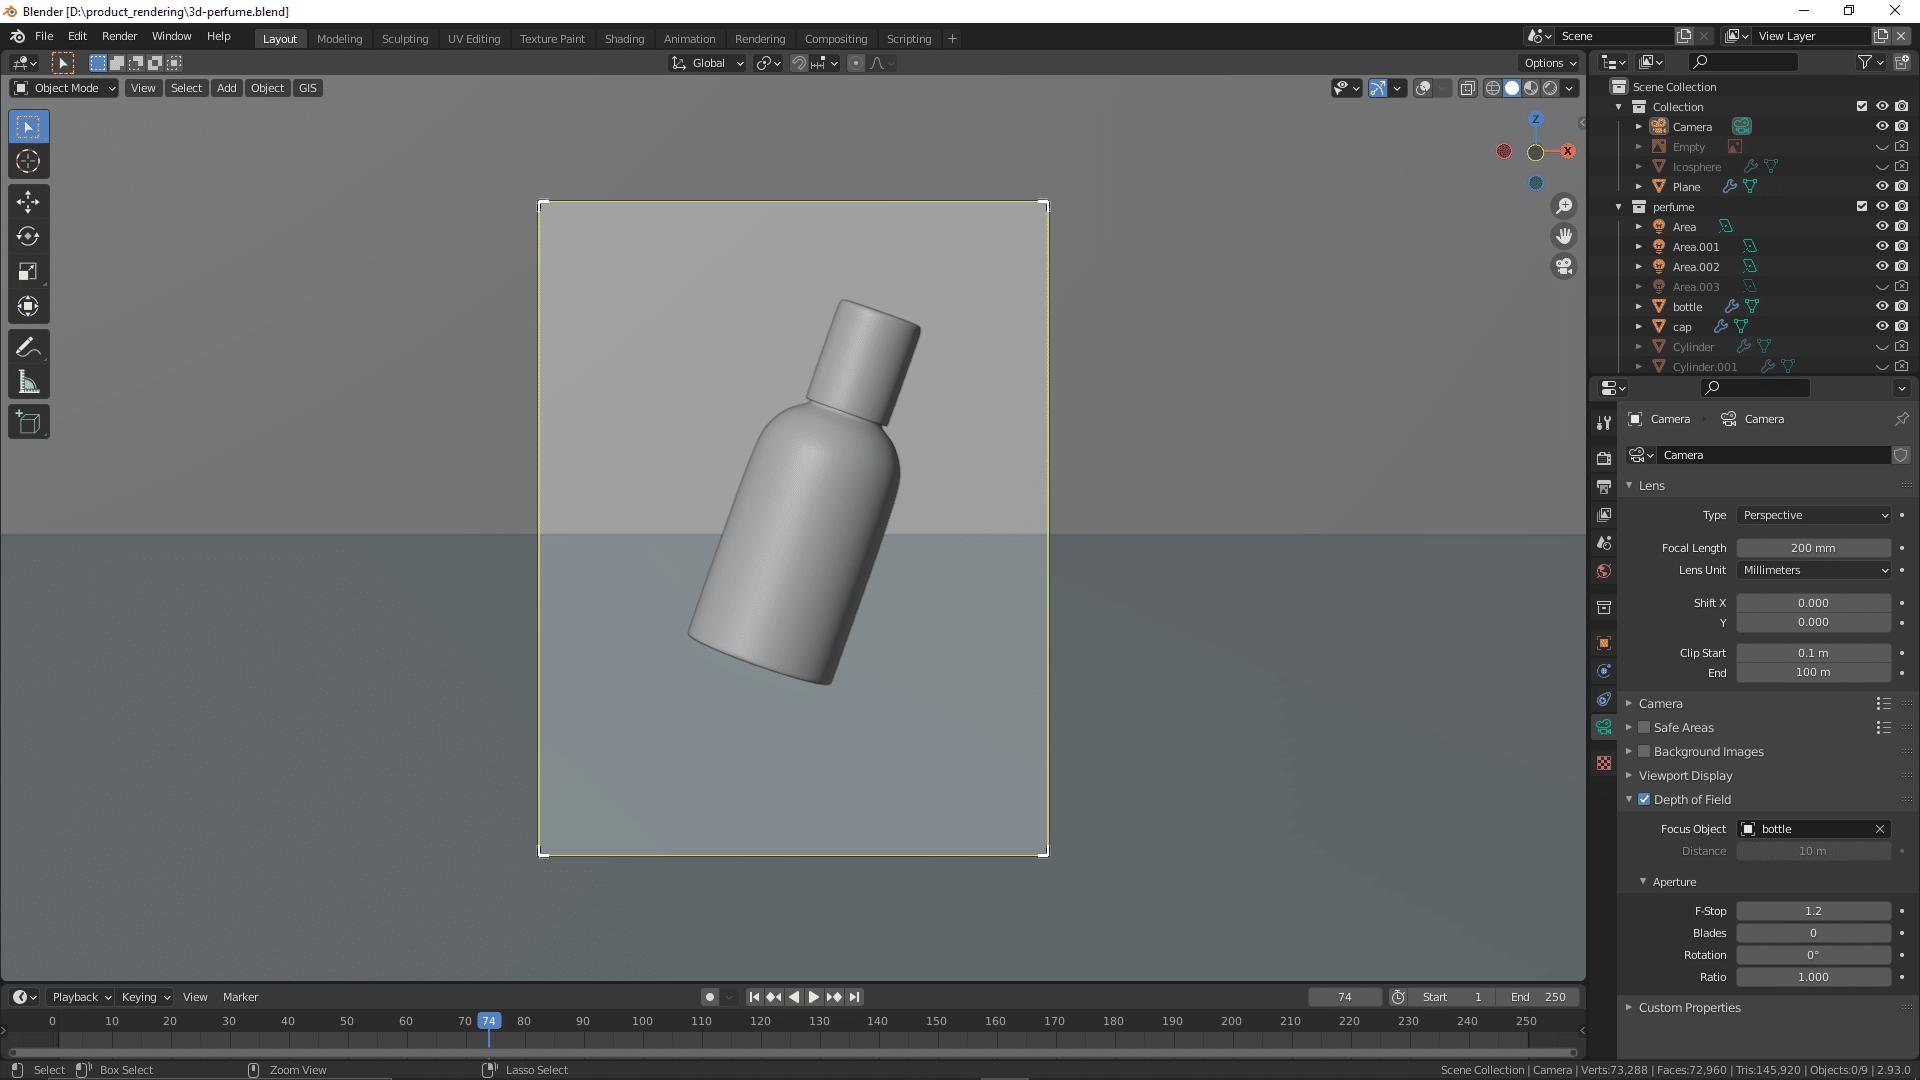 Parfümflasche in 3D